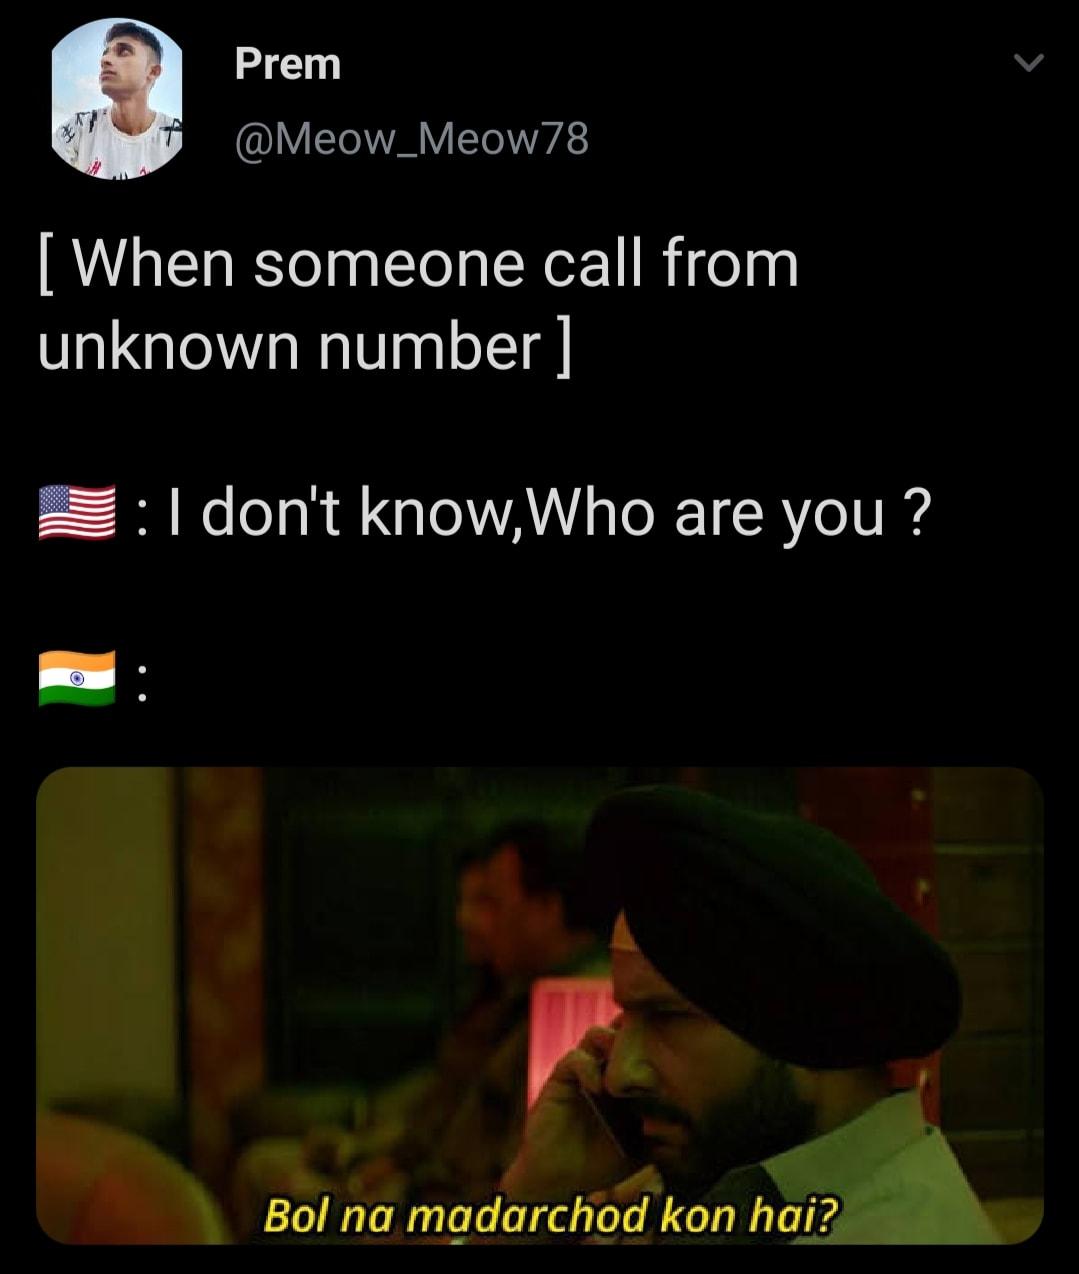 india v/s america sacred games meme